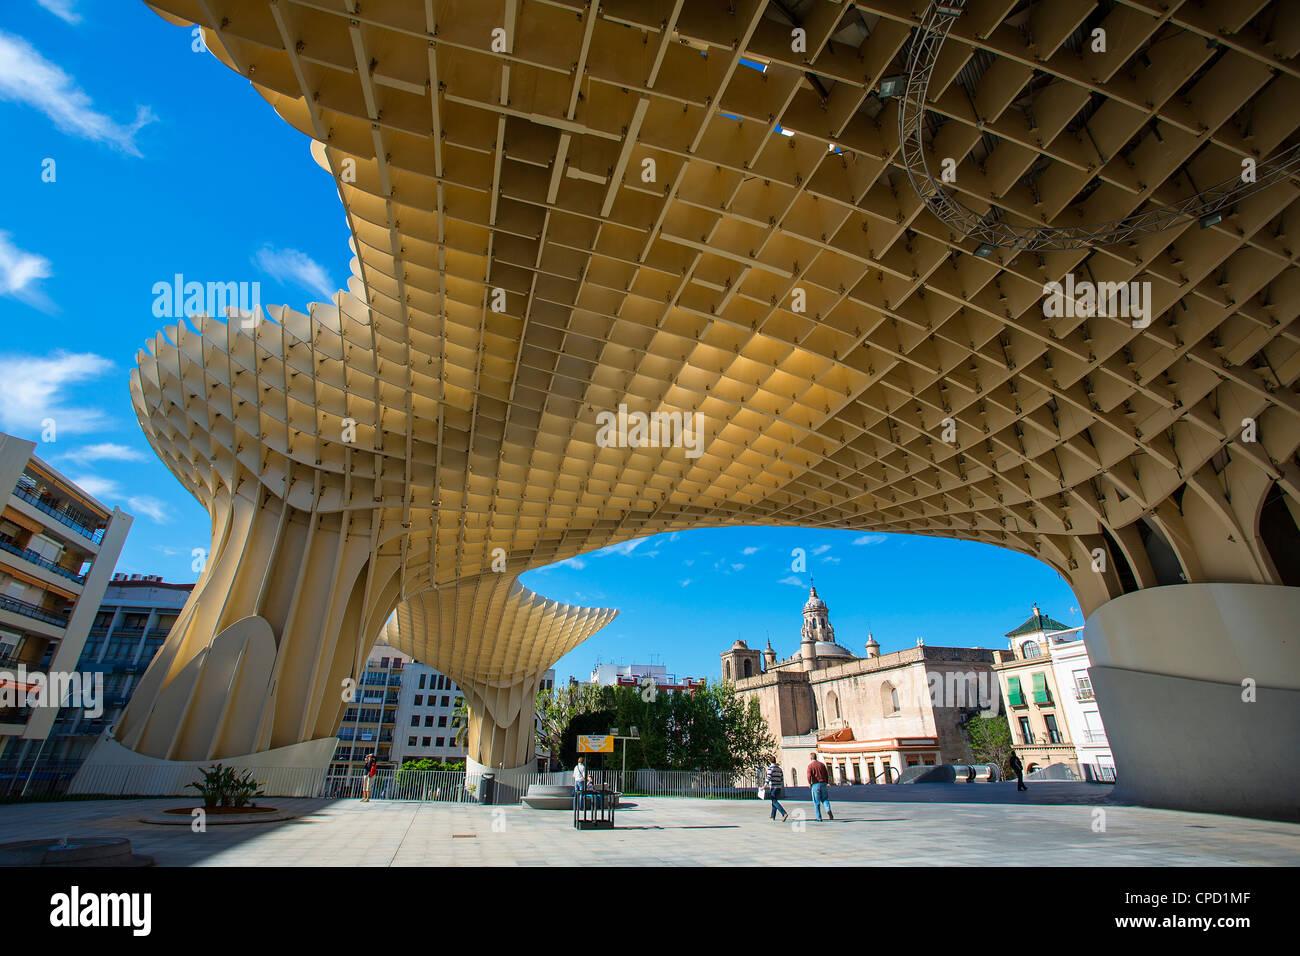 Seville, Metropol Parasol, J. Mayer H Architects - Stock Image